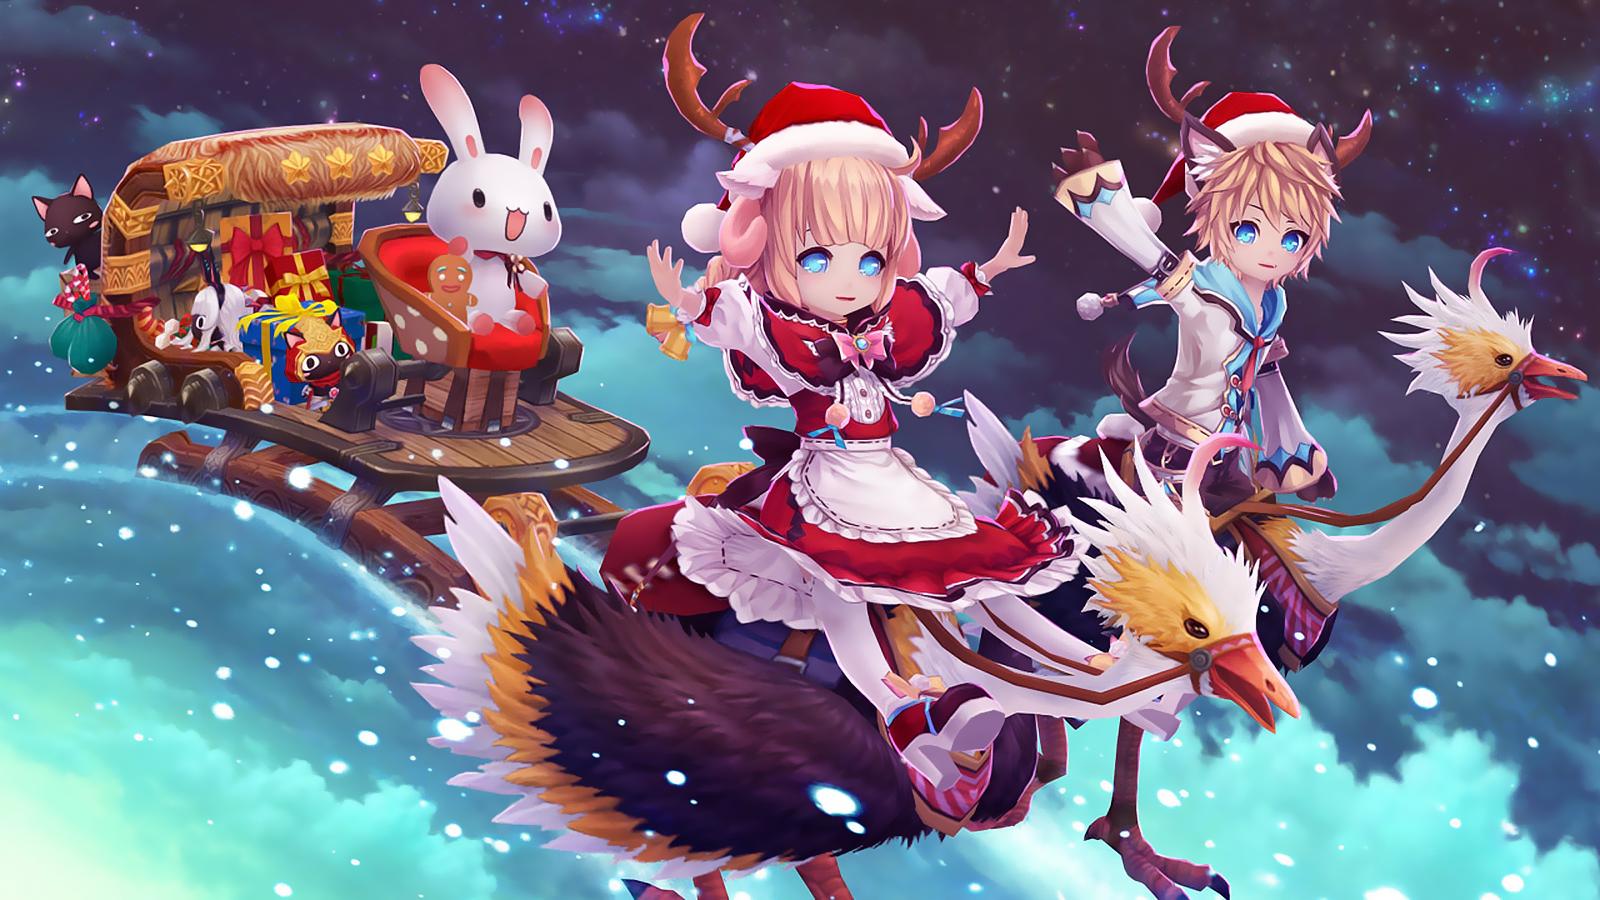 Hansel Gretel Christmas Wallpaper Png